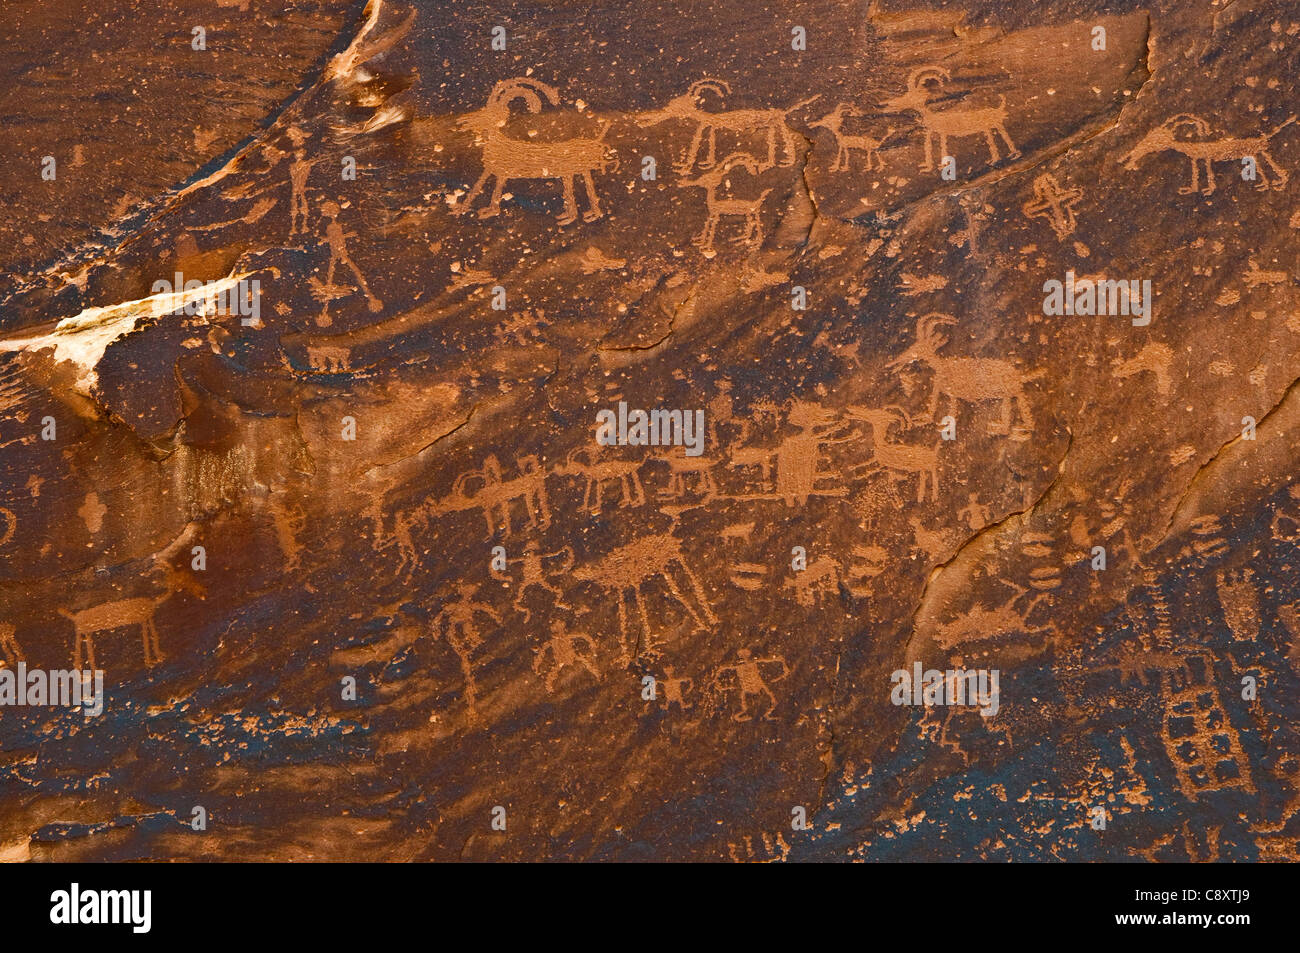 Sand Island petroglyph site over San Juan River, Bears Ears National Monument, near Bluff, Utah, USA - Stock Image